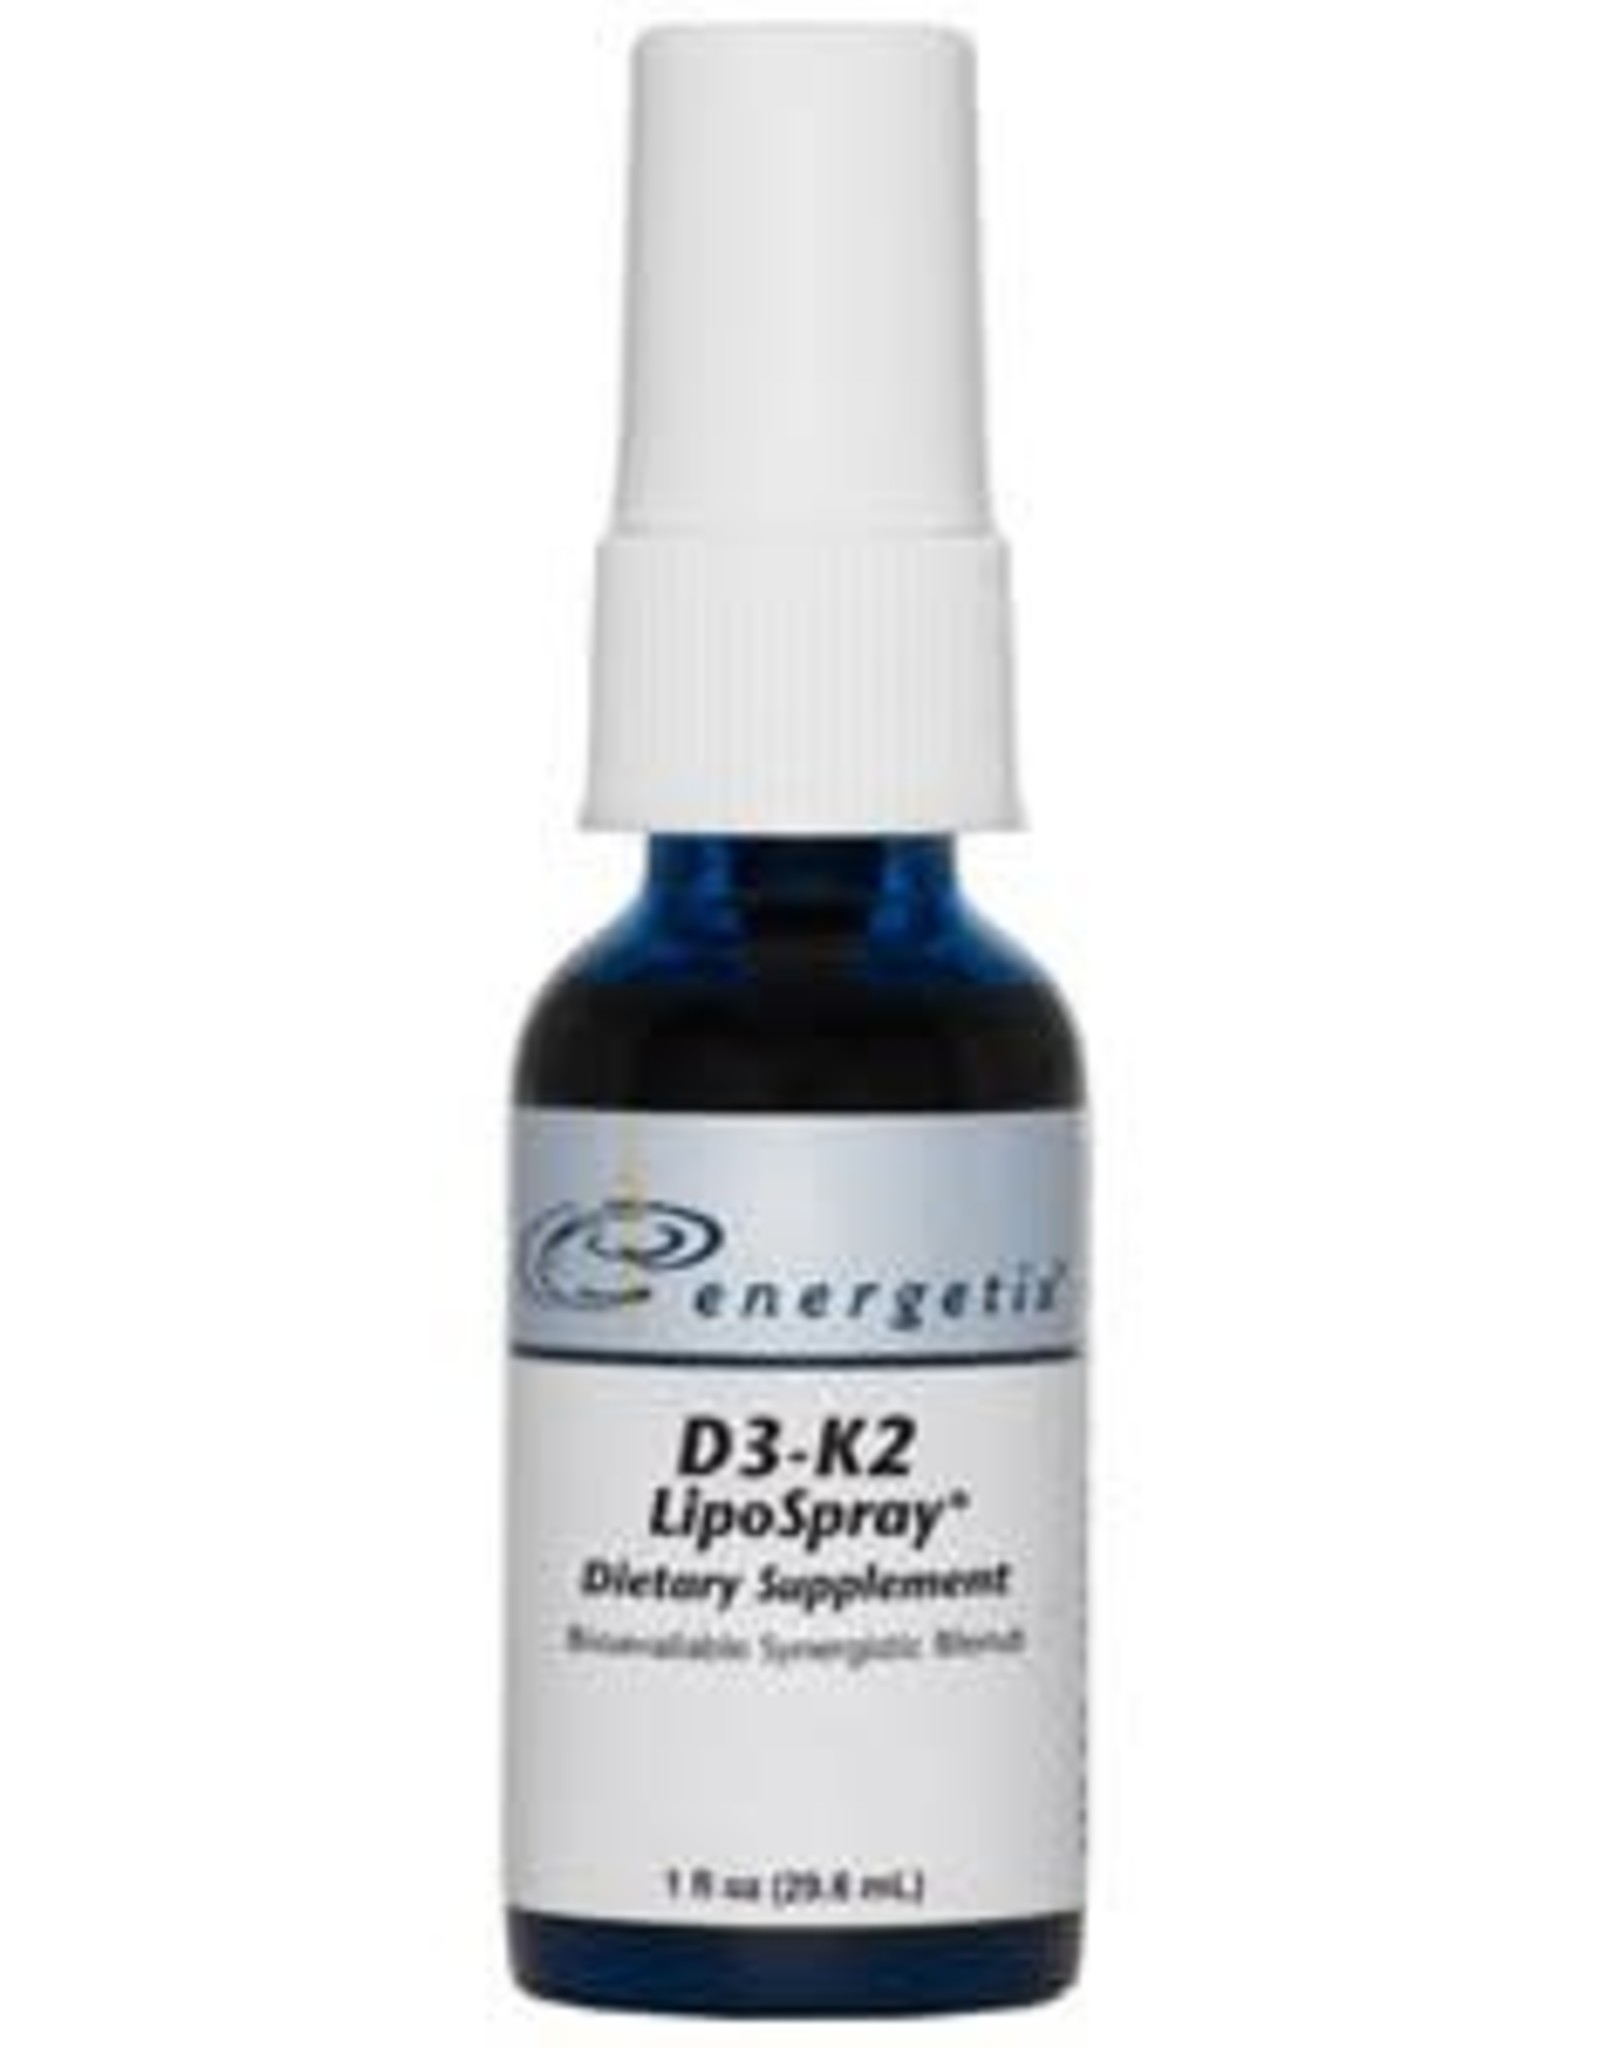 Energetix D3-K2 LipoSpray 1 oz.